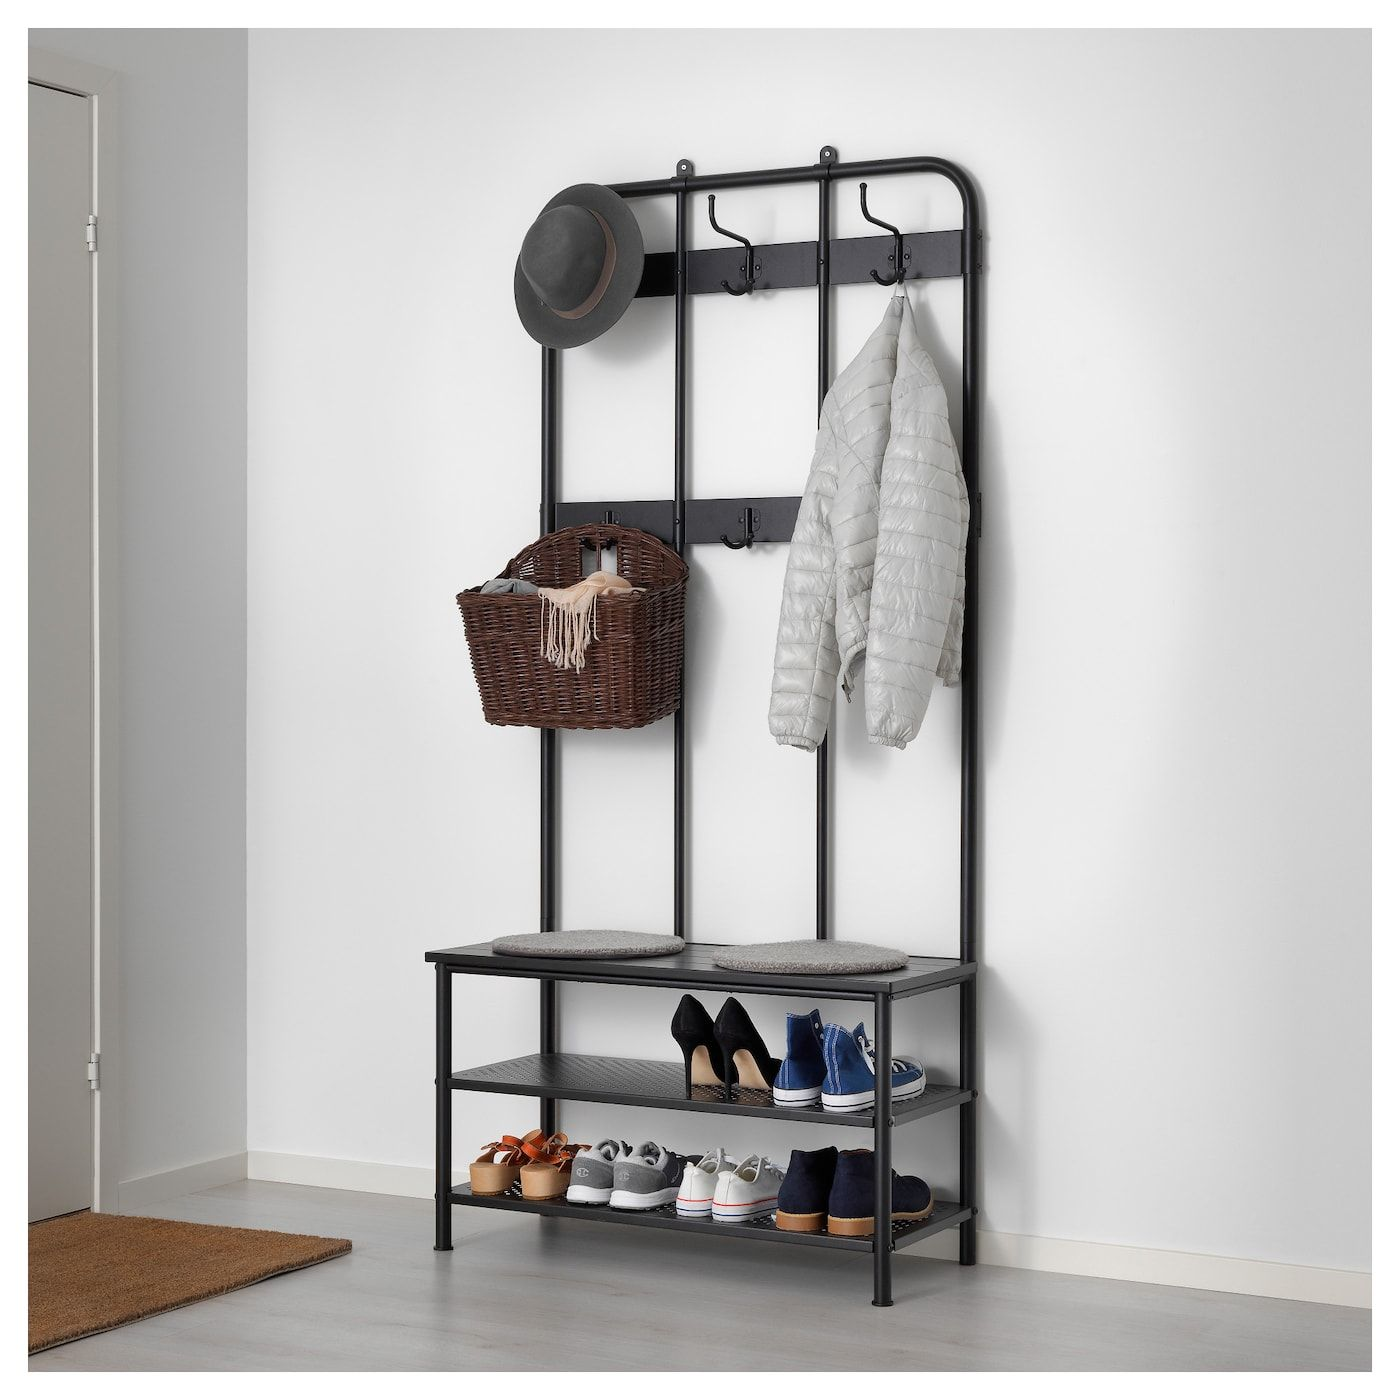 Pinnig Coat Rack With Shoe Storage Bench Black 76 In 2020